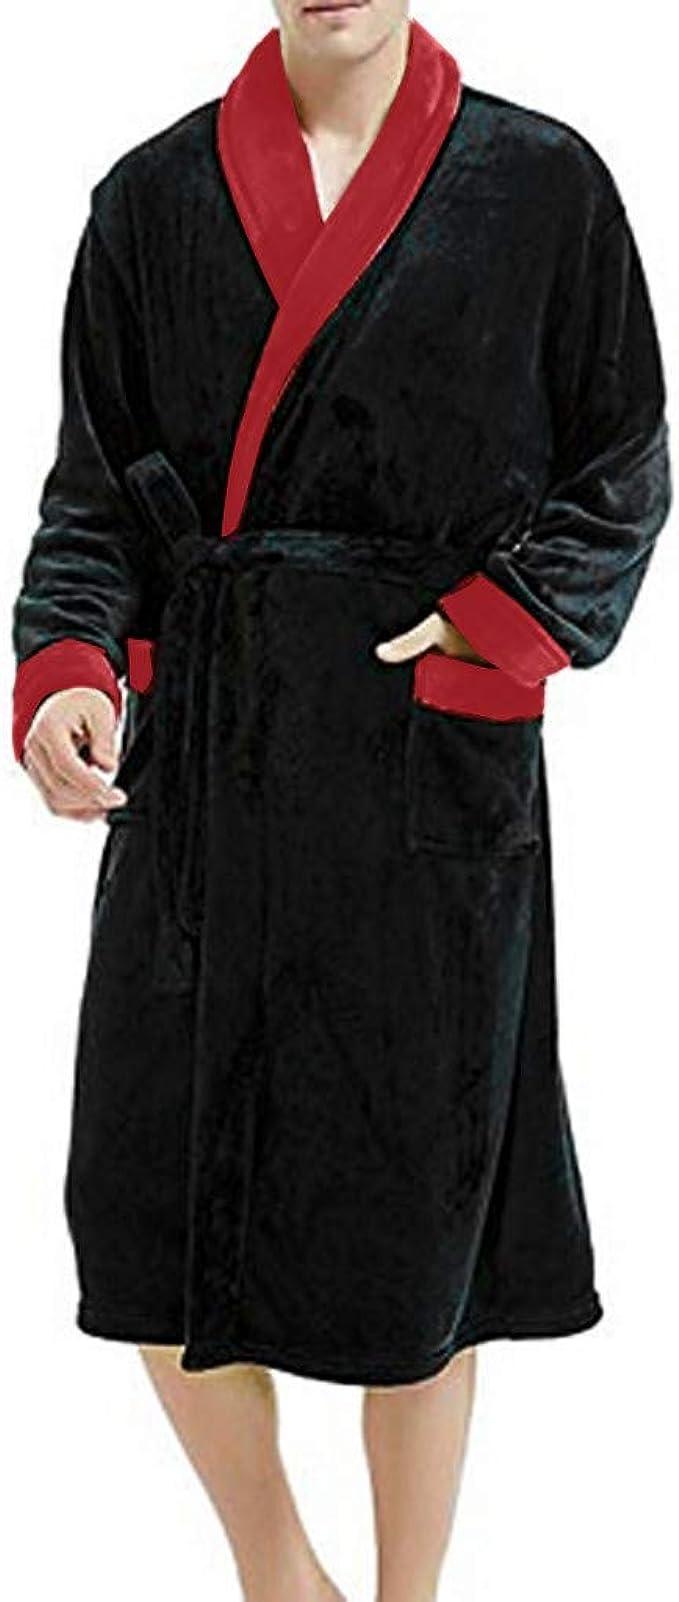 Mens Winter Plush Lengthened Shawl Bathrobe Home Clothes Long Sleeved Robe Coat Robe